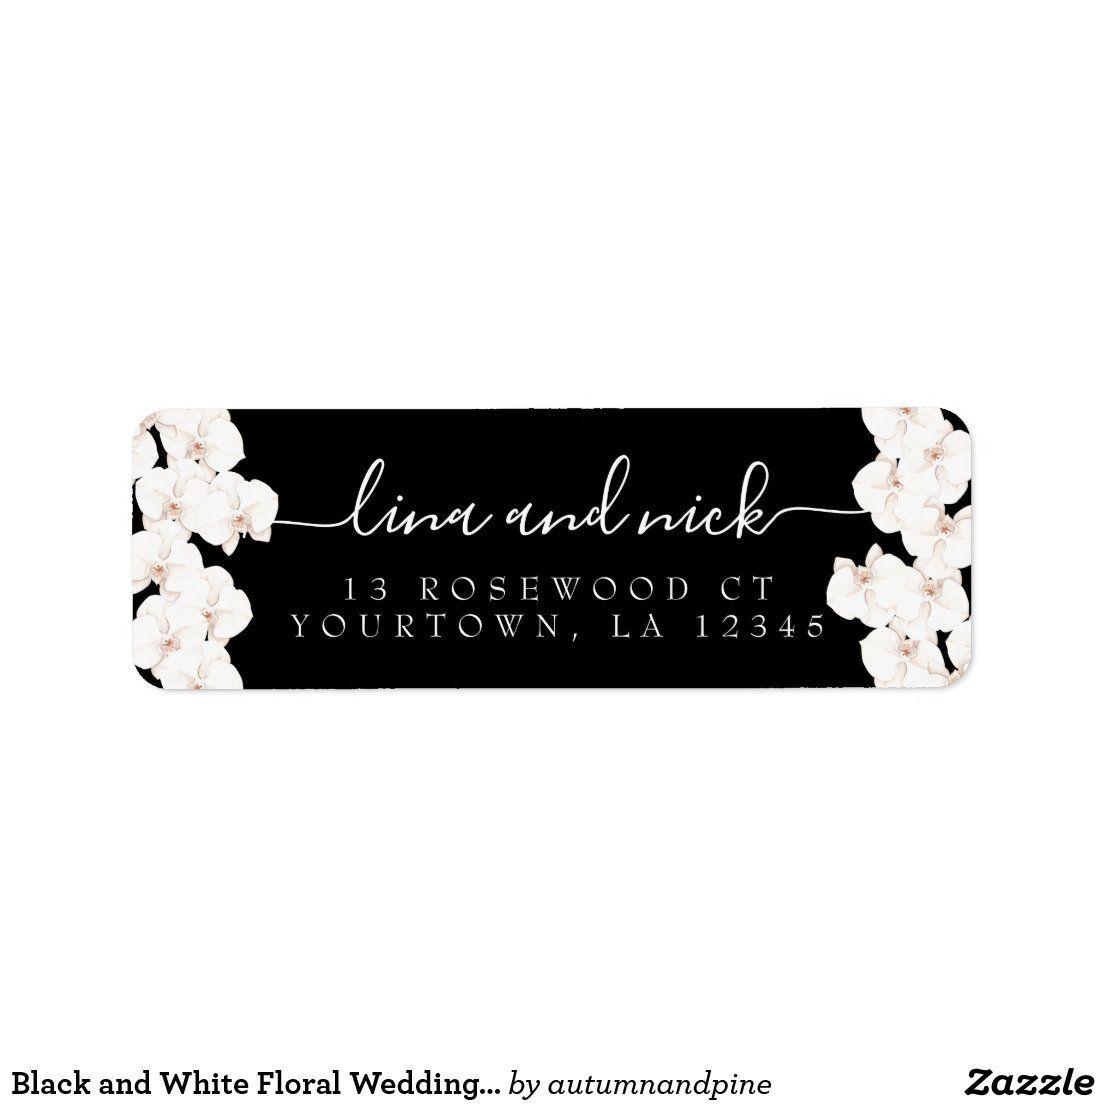 Black And White Floral Wedding Return Address Label Zazzle Com Return Address Wedding Return Address Labels Address Labels Wedding return address label template